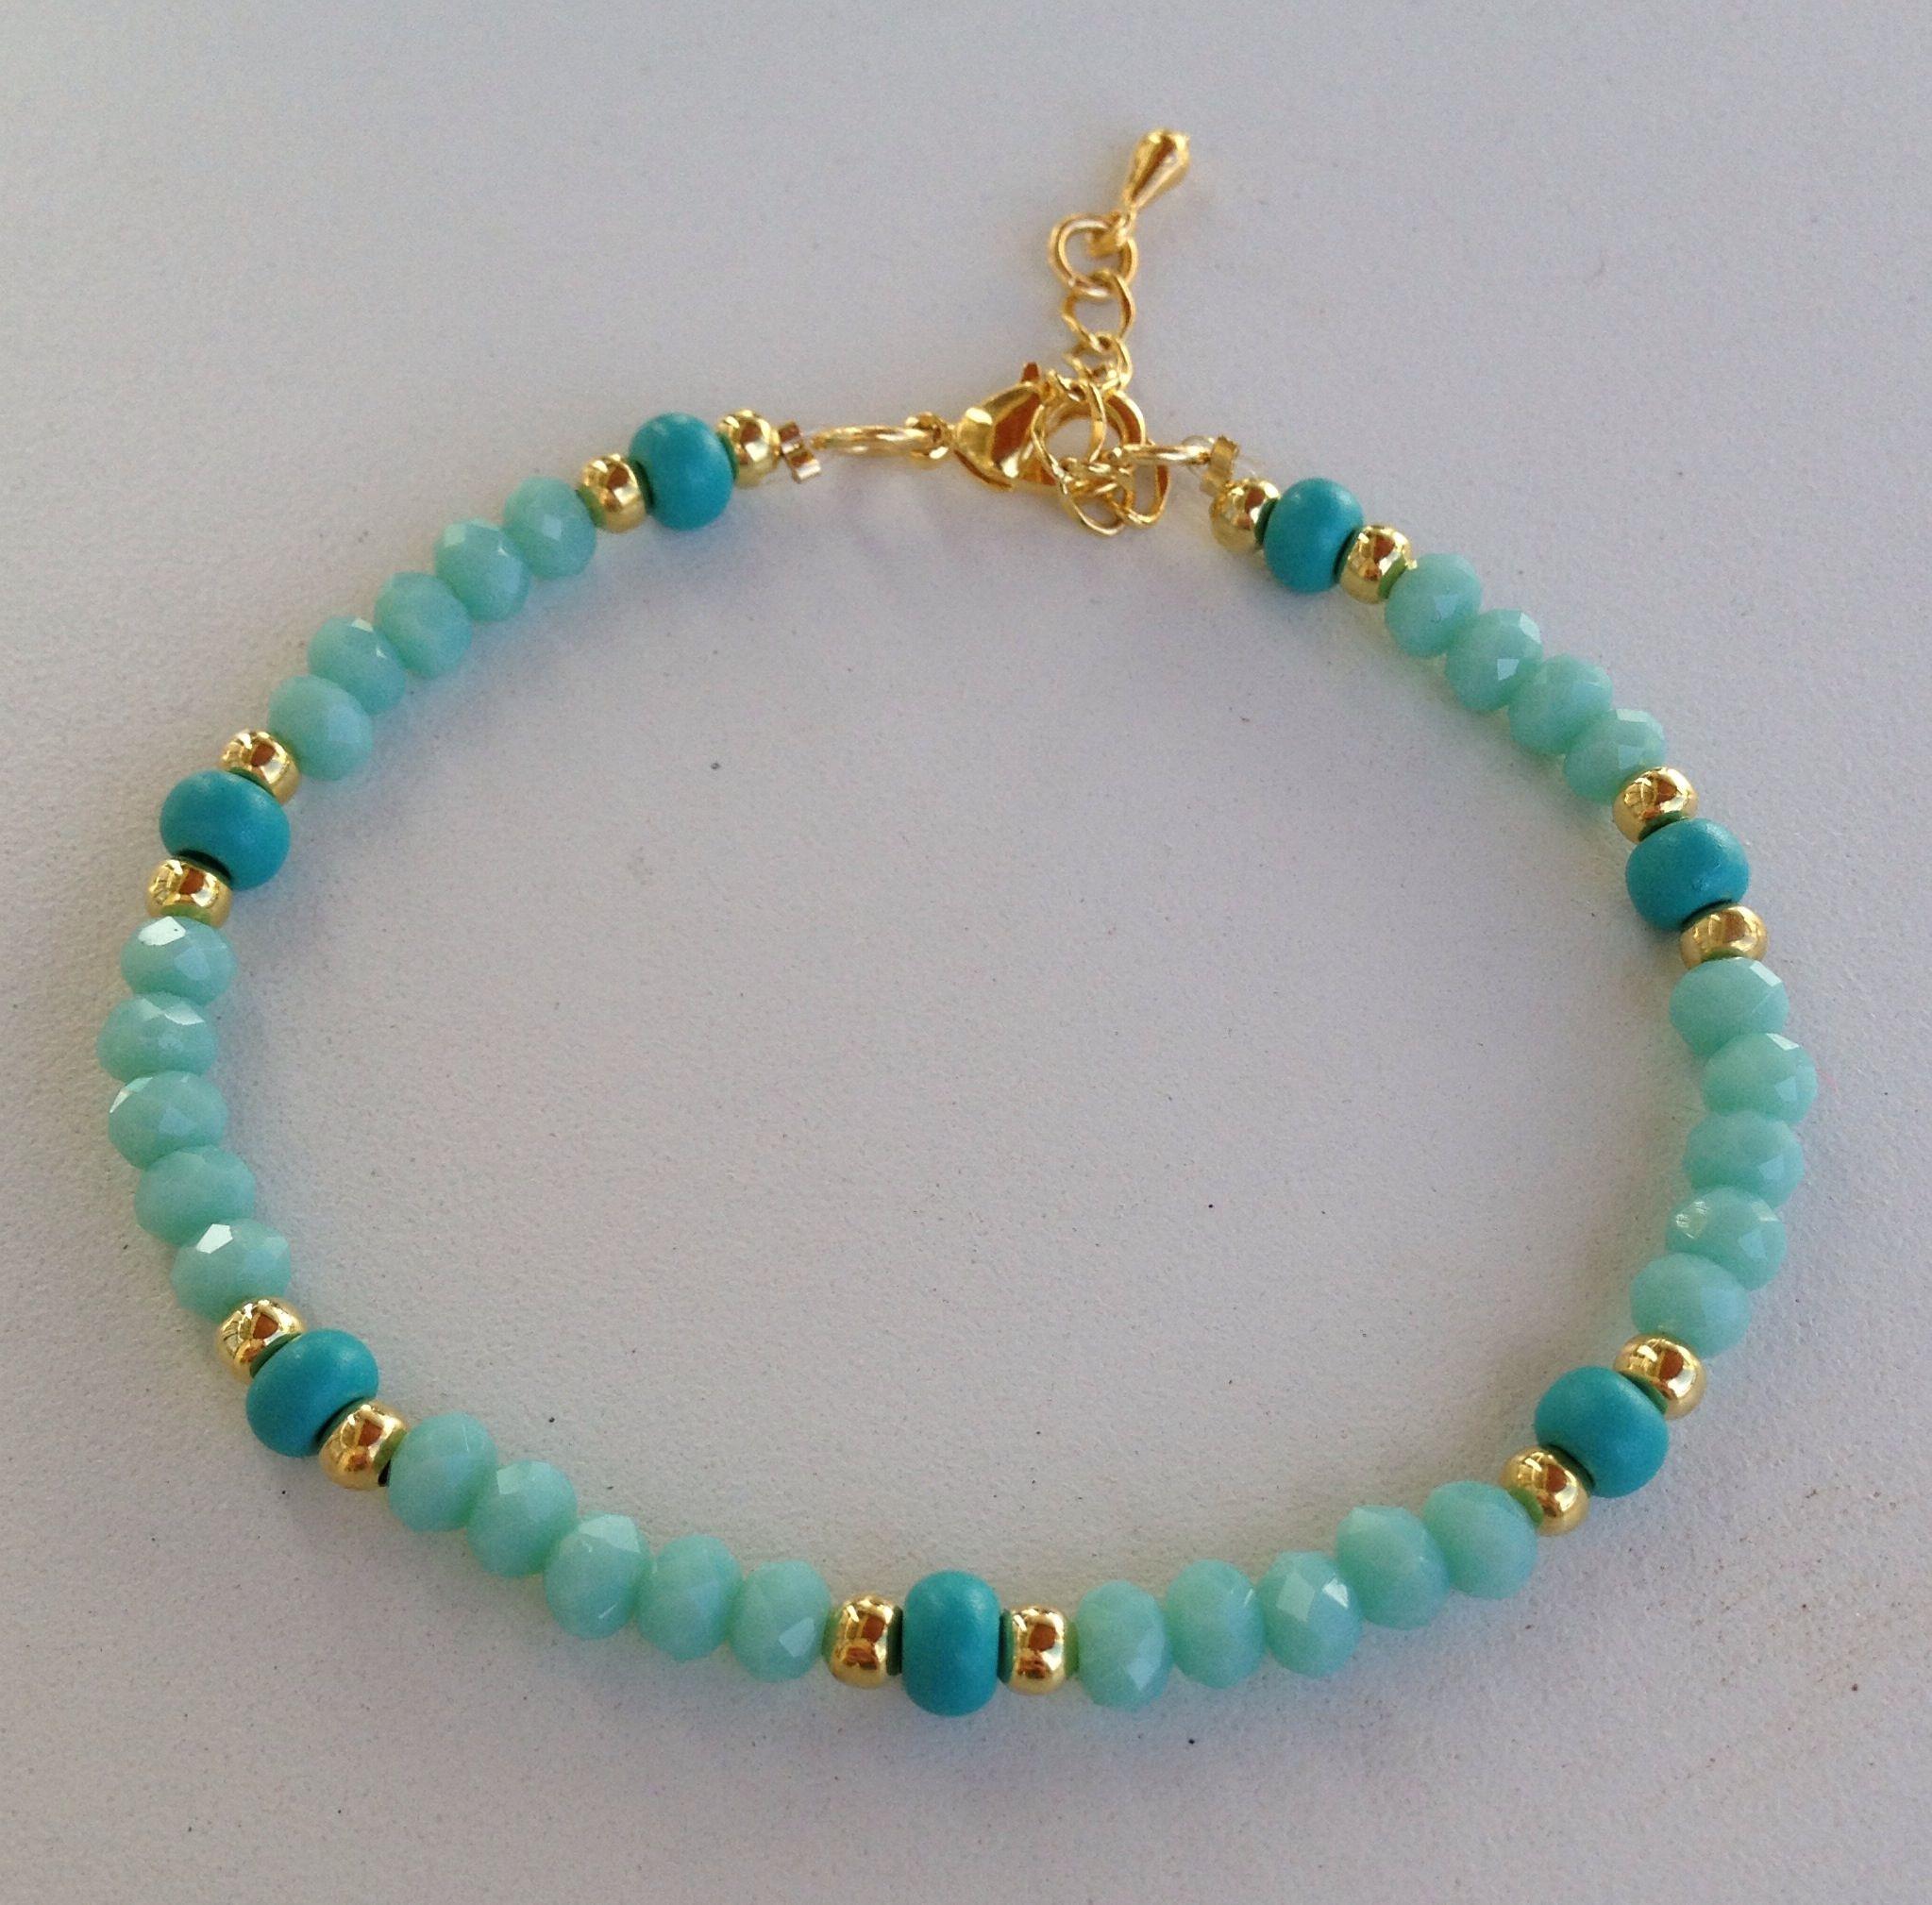 52da2a51658a Turquoise crystal beaded bracelet pulseira de cristal turquesa ...